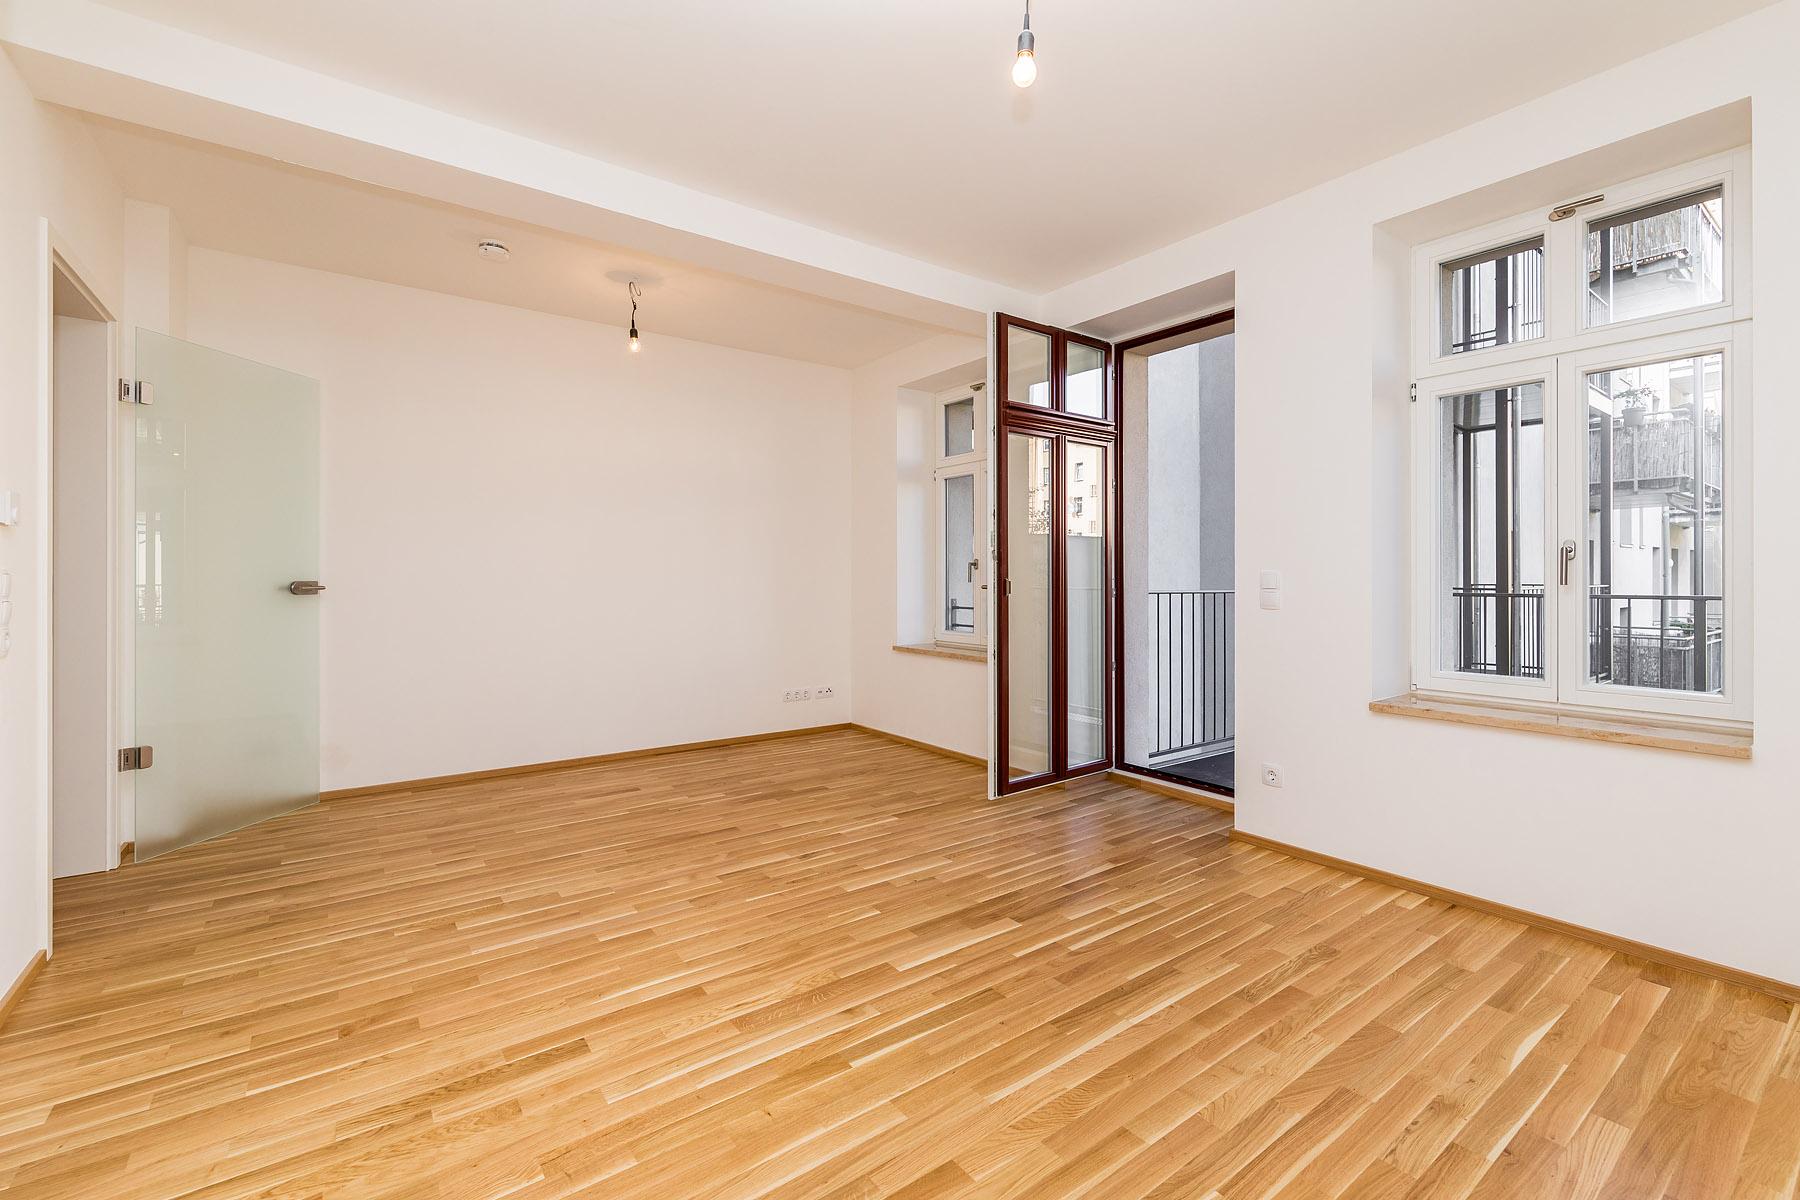 2020_konradstrasse-43-42